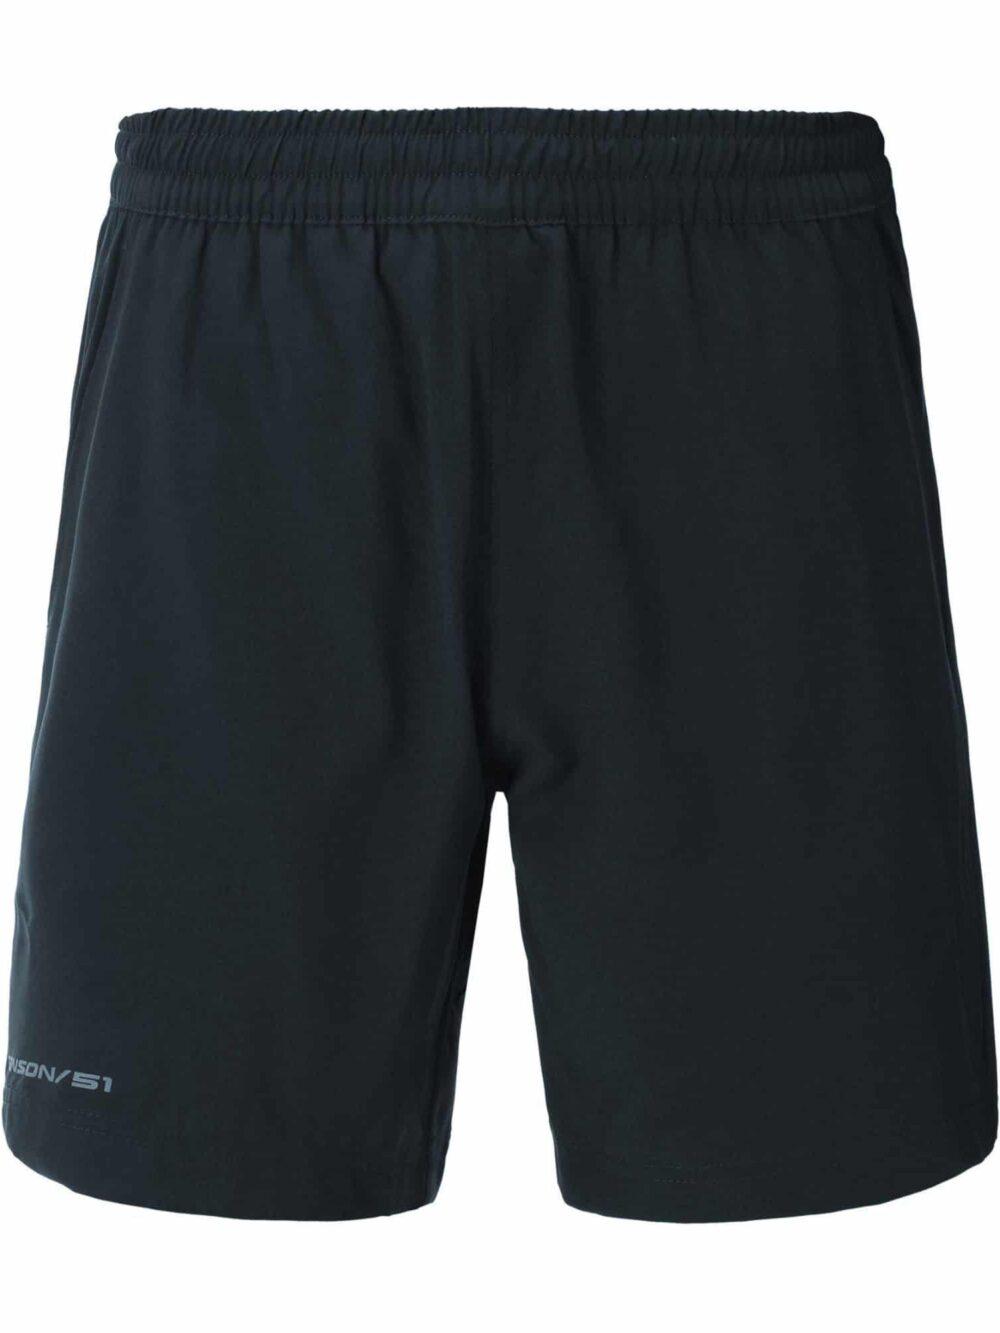 Tenson Shorts Joar Black